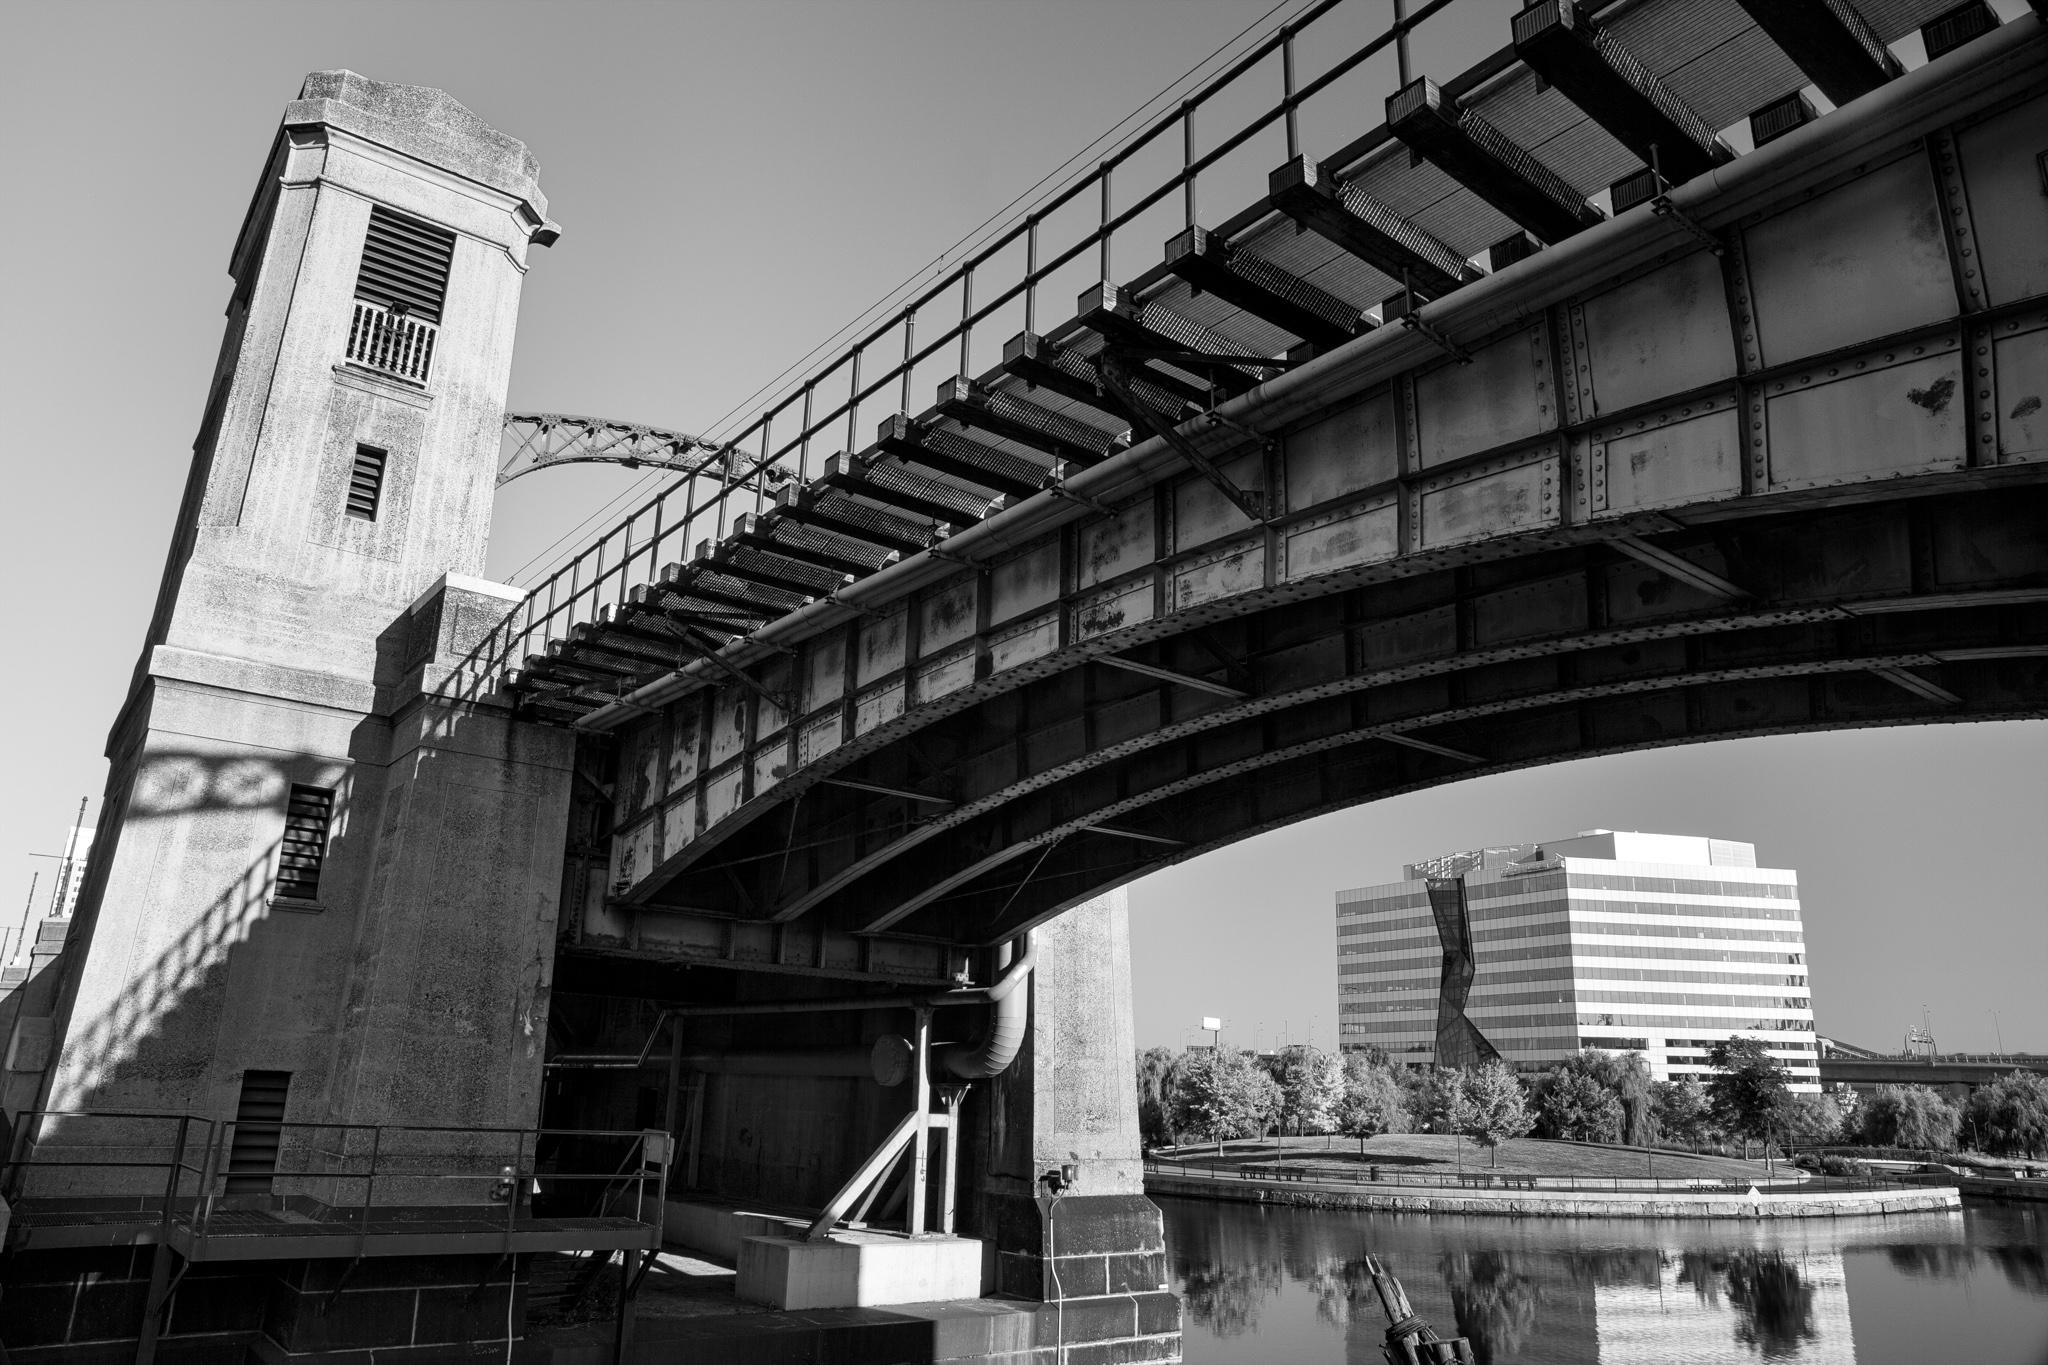 boston-architecture-us_ma_bos-0834-2.jpg